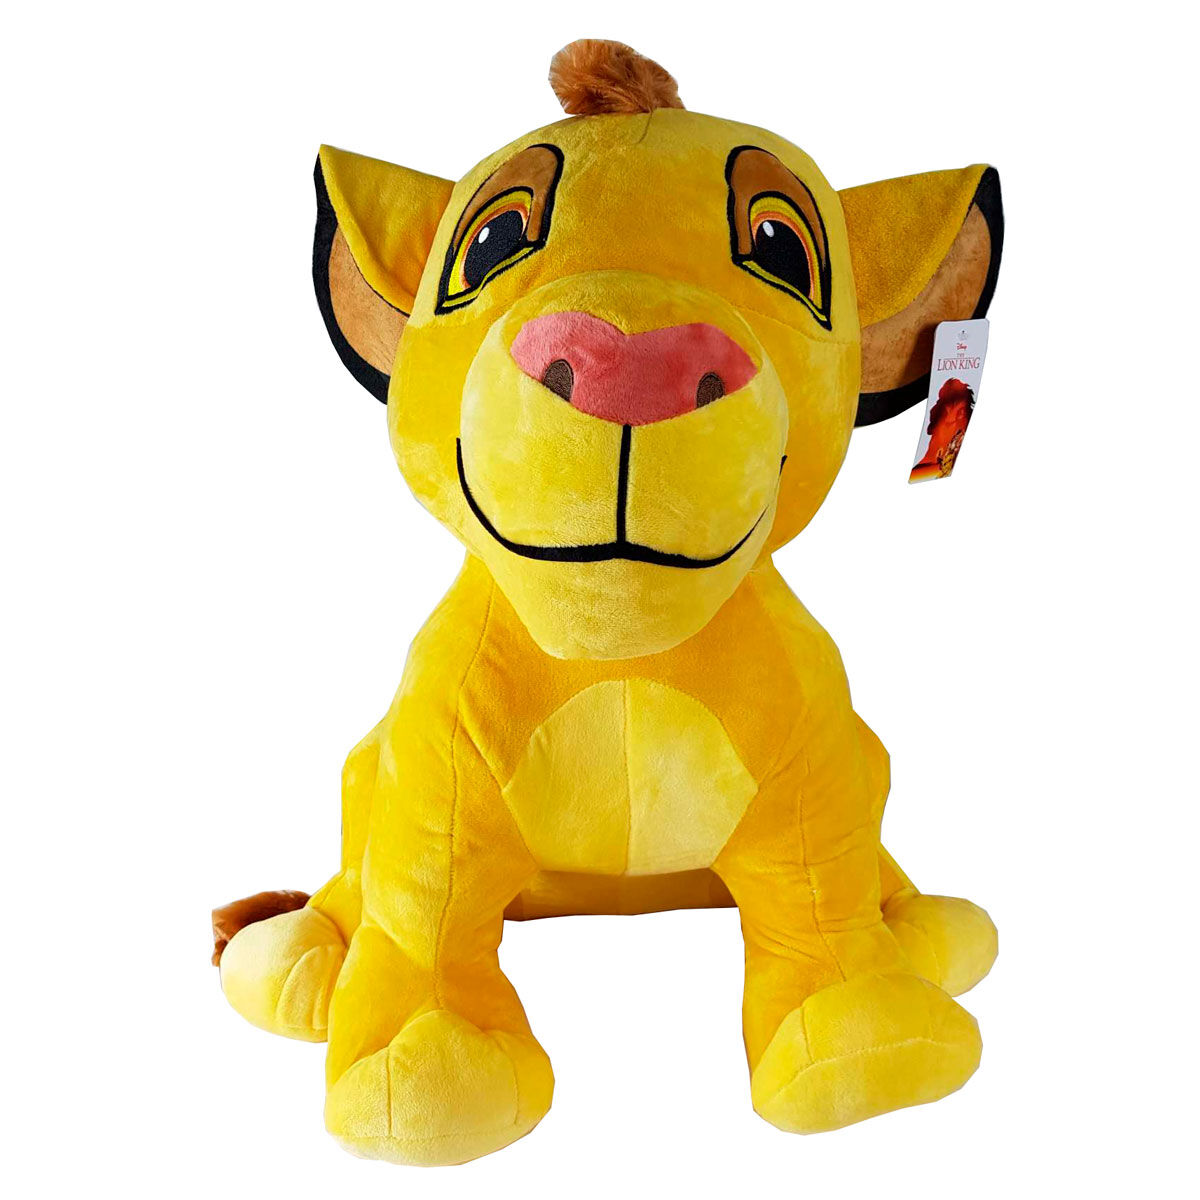 Giant plush Simba The Lion King Disney soft 58cm